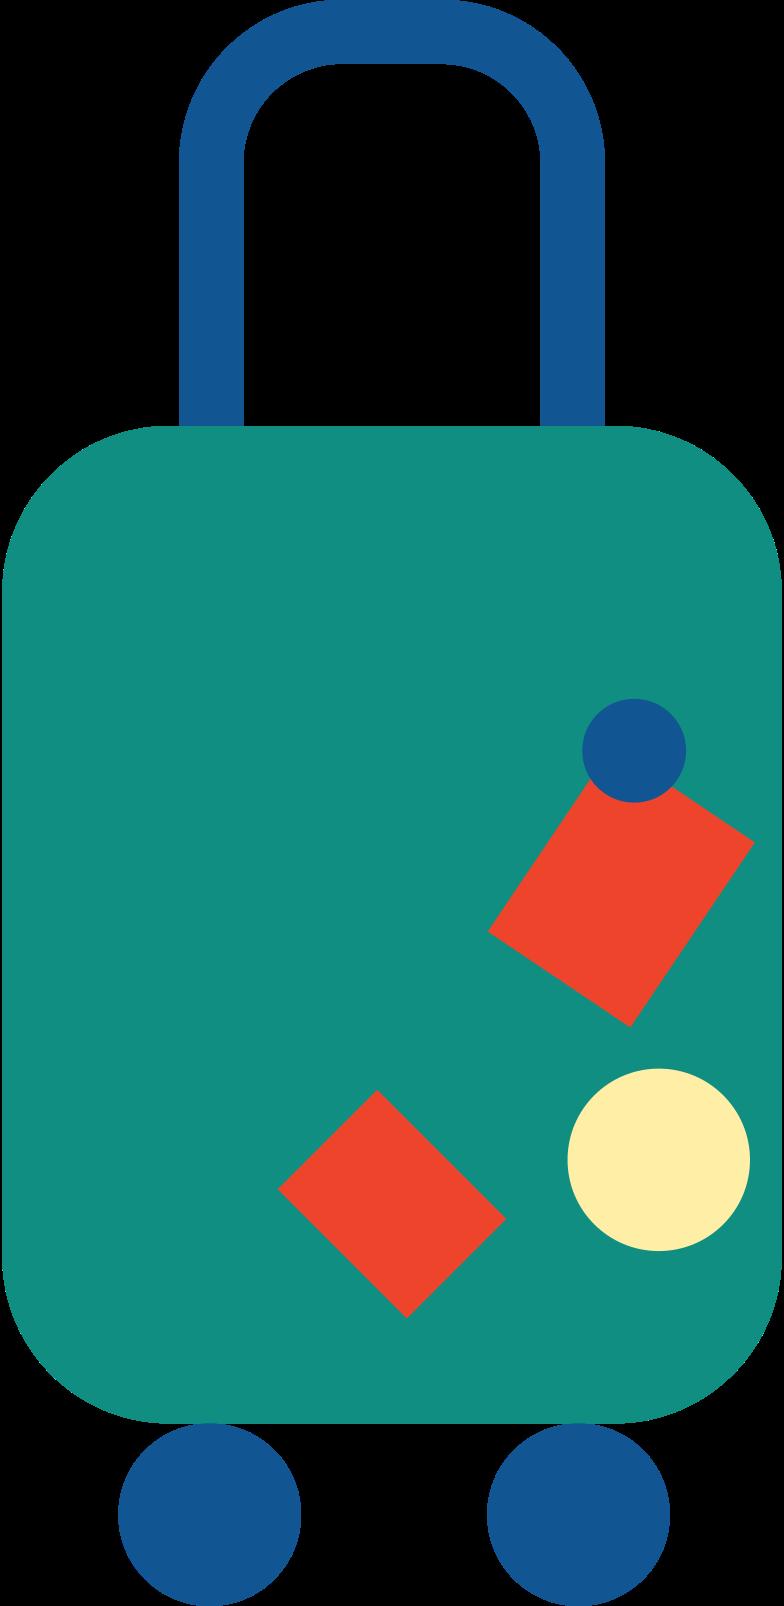 suitecase Clipart illustration in PNG, SVG